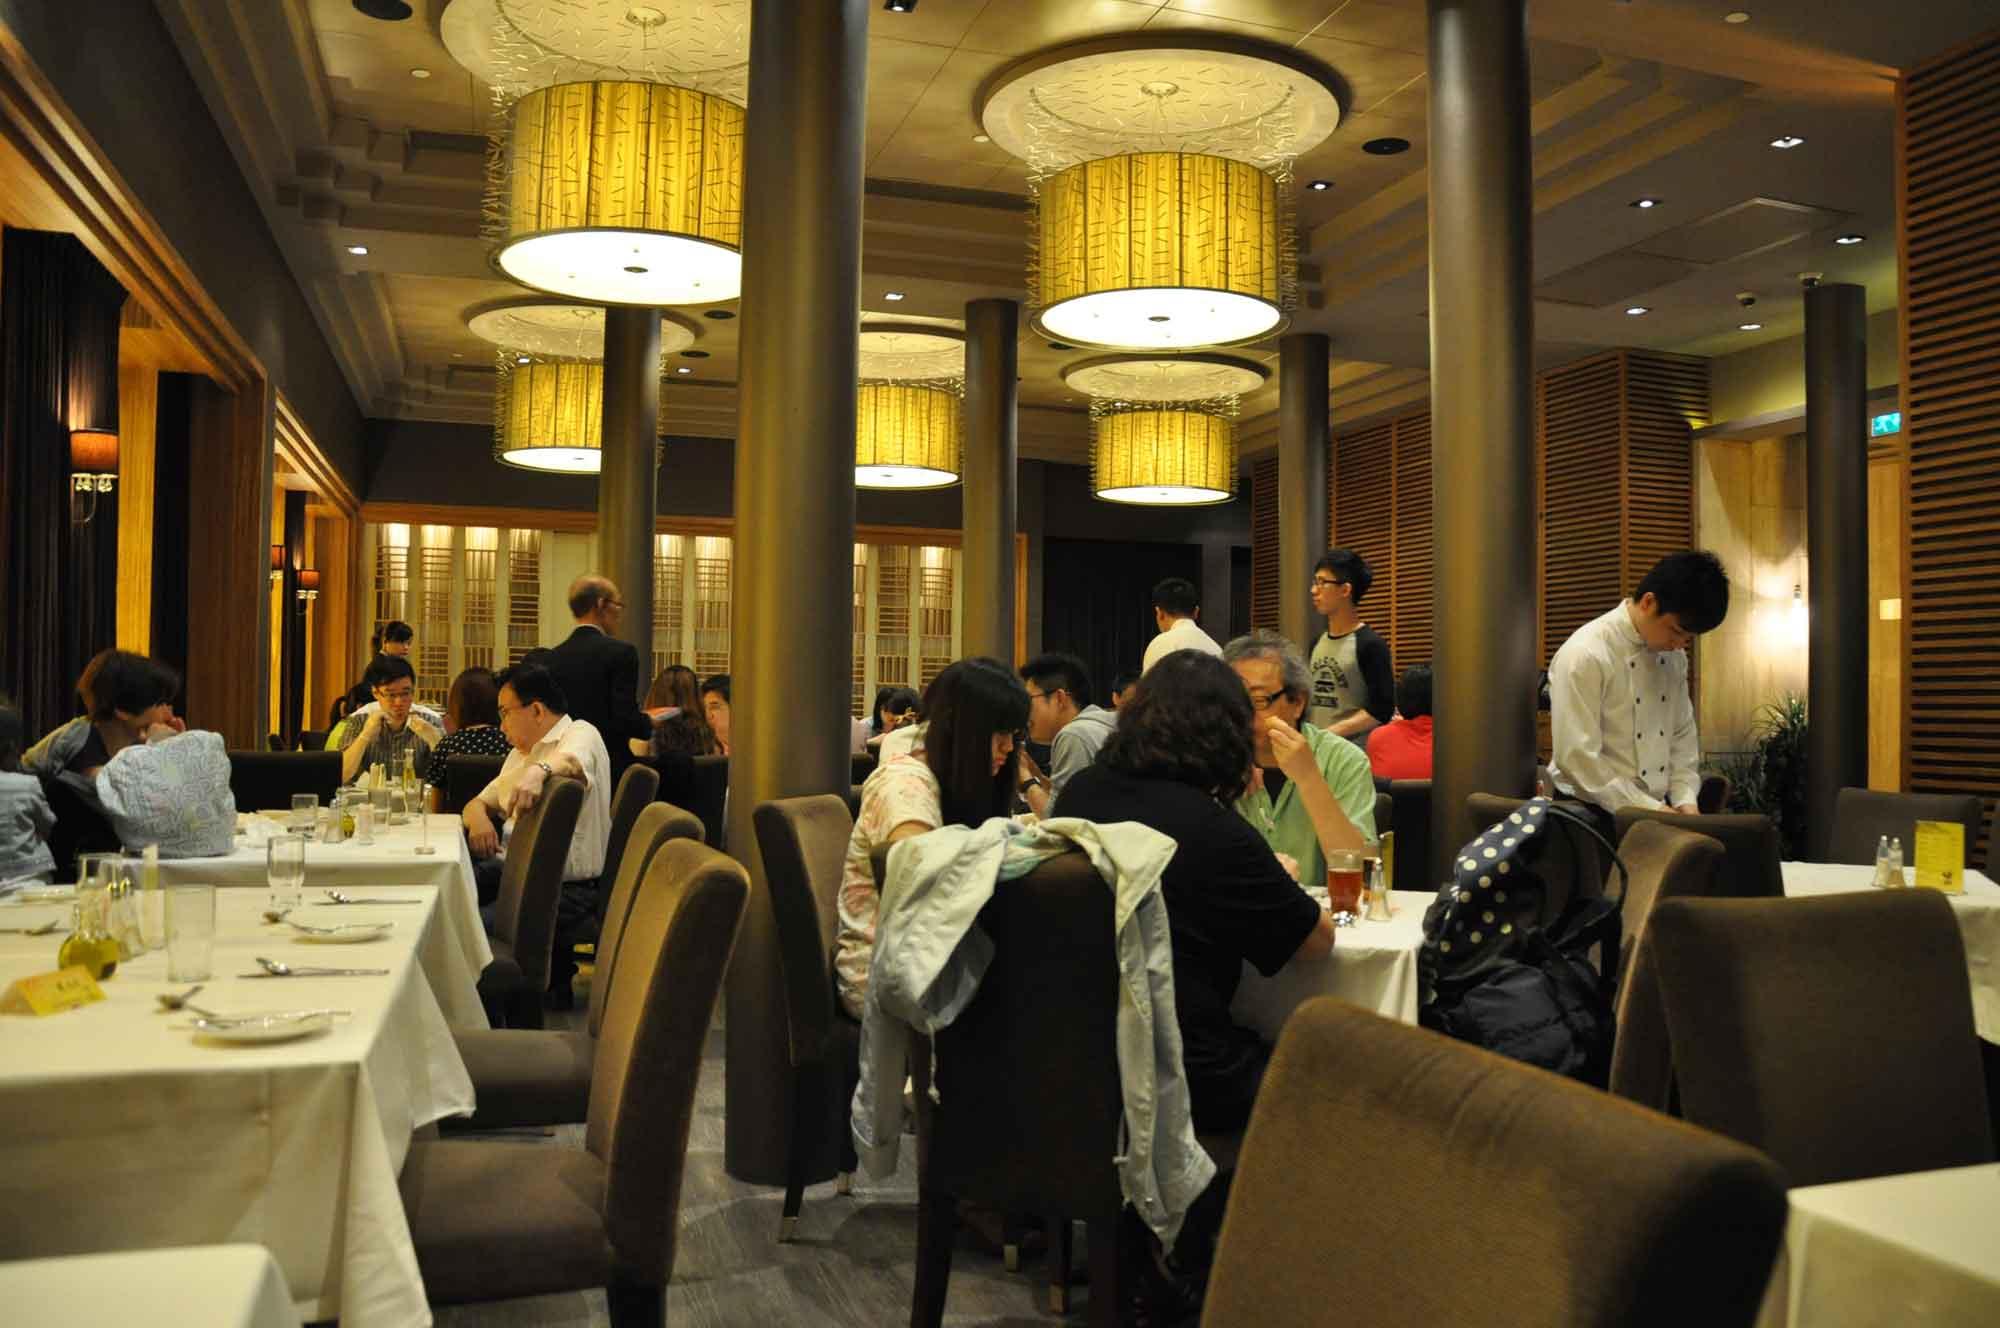 Fat Siu Lau inside seating